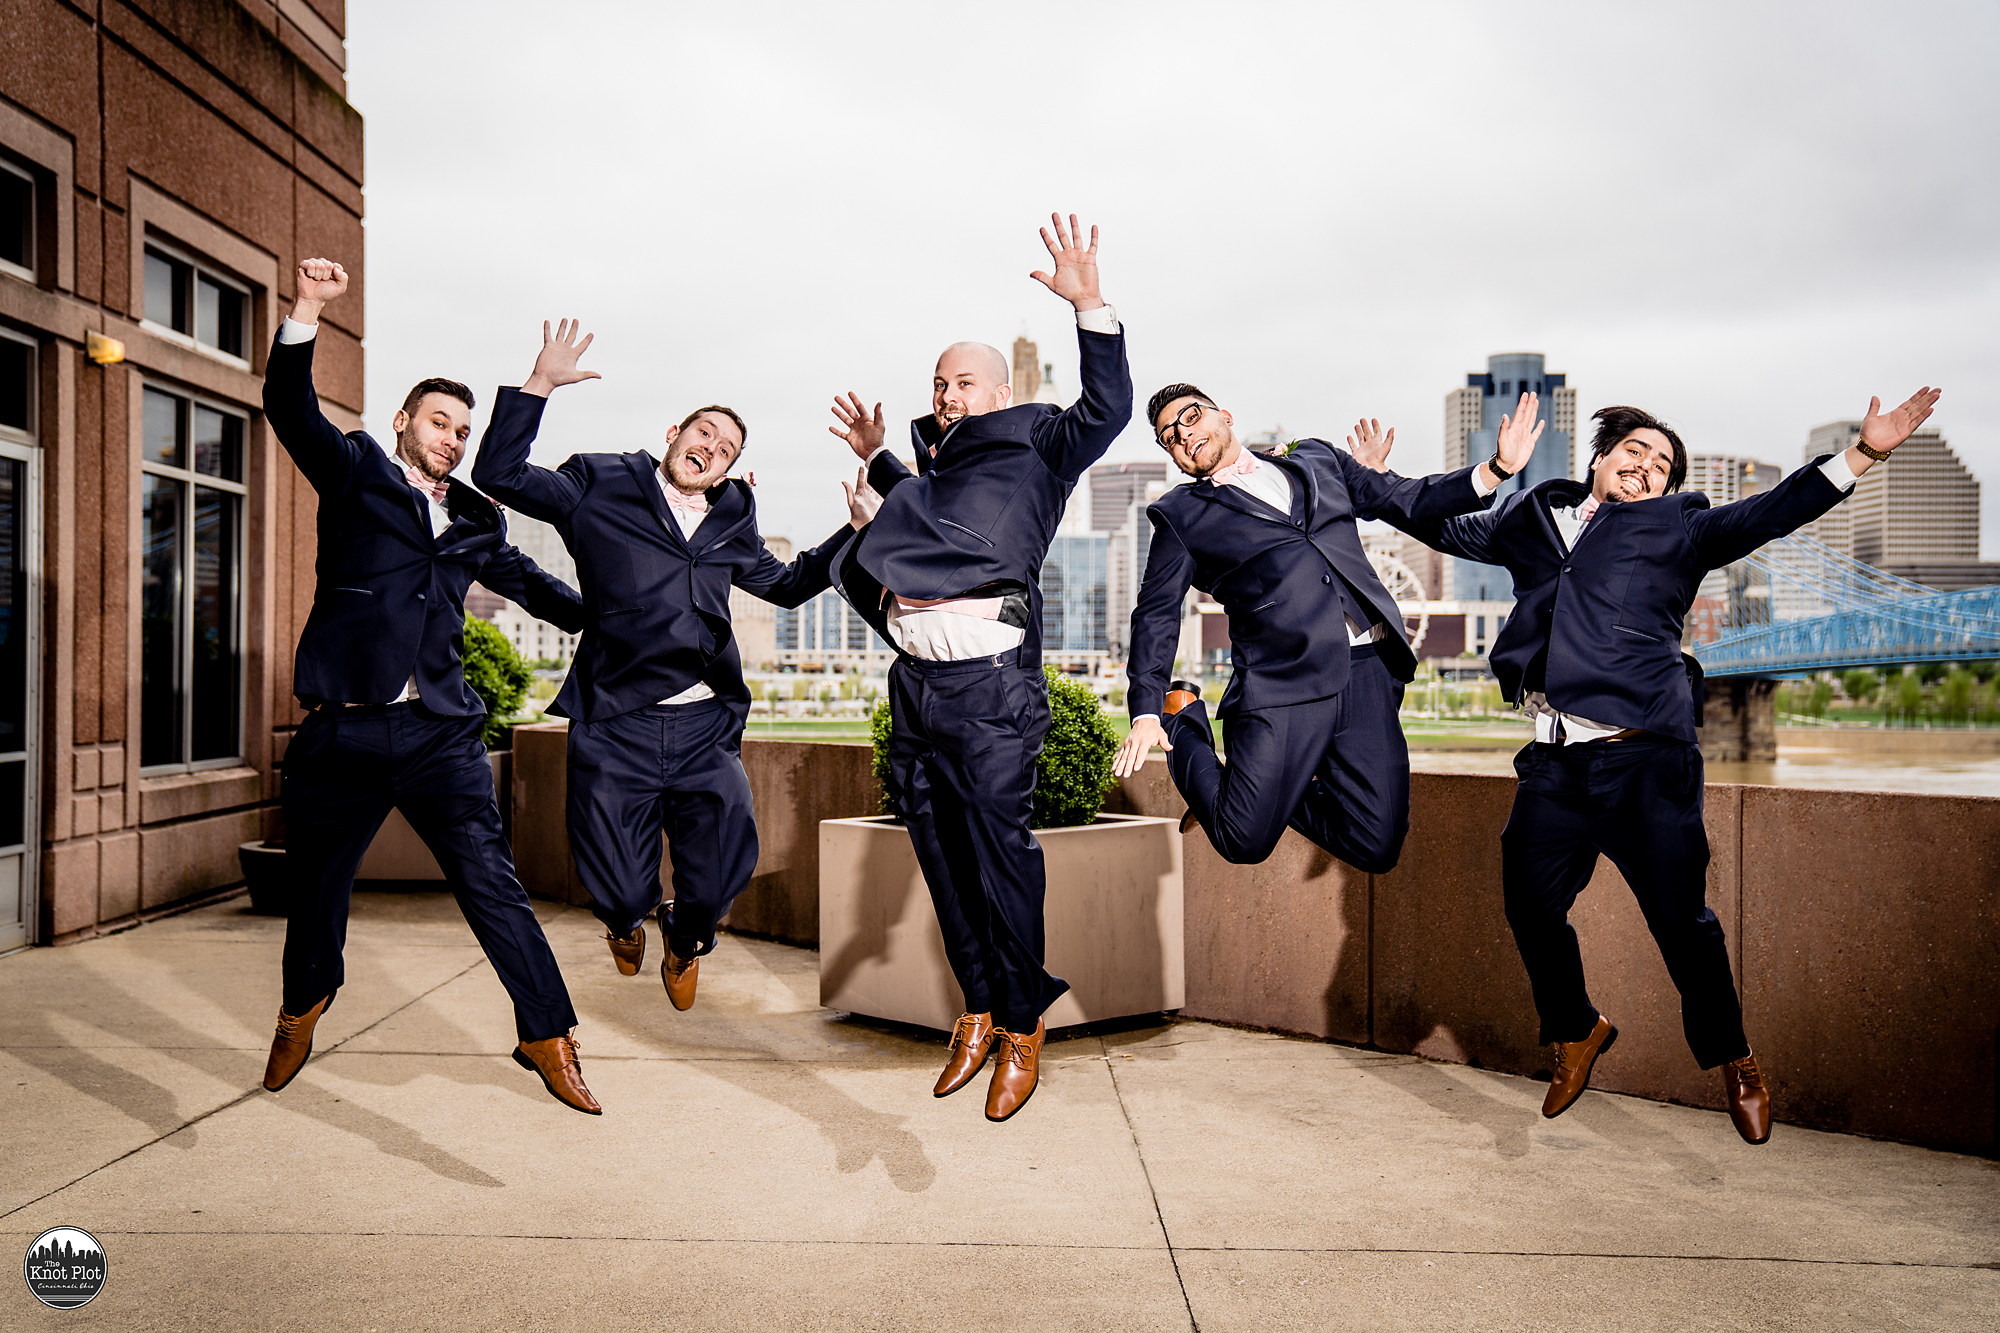 Embassy-Suites-Rivercenter-Cincinnati-Wedding-Photography-12.jpg